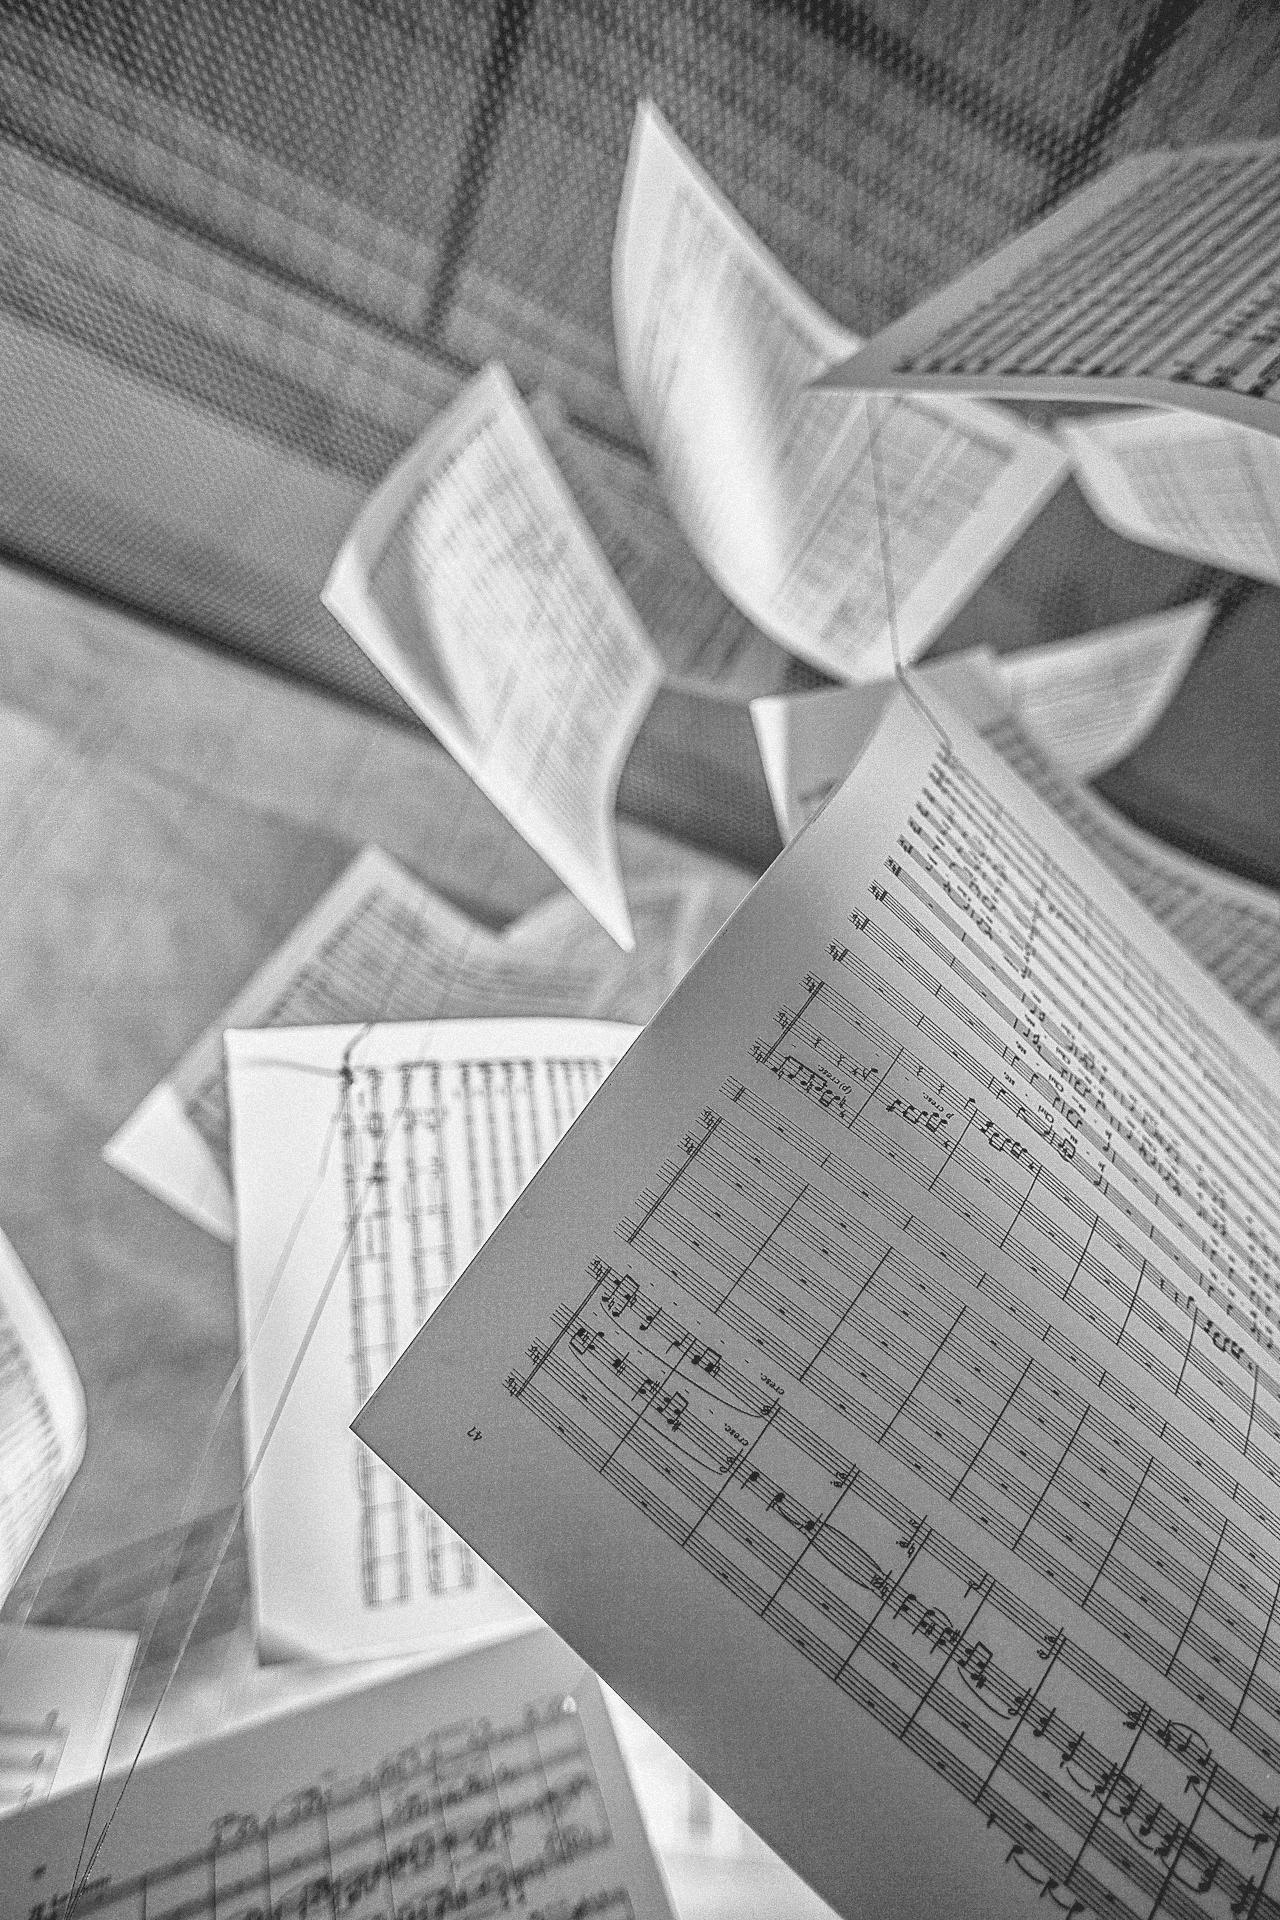 10-Aniversario-Casa-da-Musica-Porto-Reportagem-Fotografica-Photographic-Coverage-Fotografia-Photography-Arquitectura-Architecture-Rem-Koolhaas-bonjourmolotov-08N2.jpg